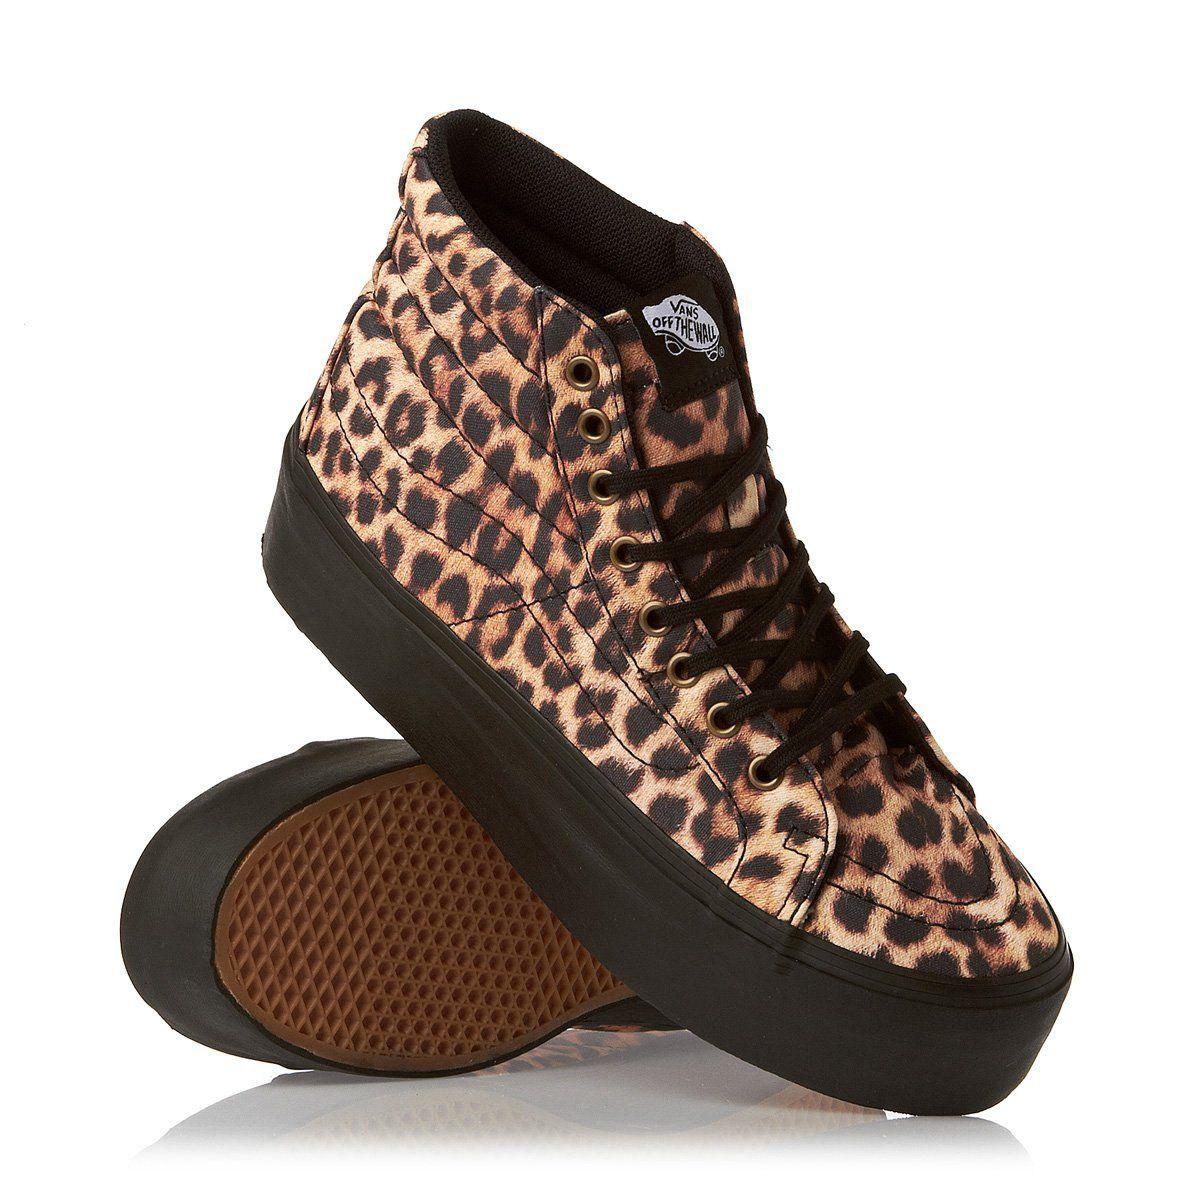 Vans Footwear Sk8 Hi Platform Sneaker Black Leopard Print  3341266cc0